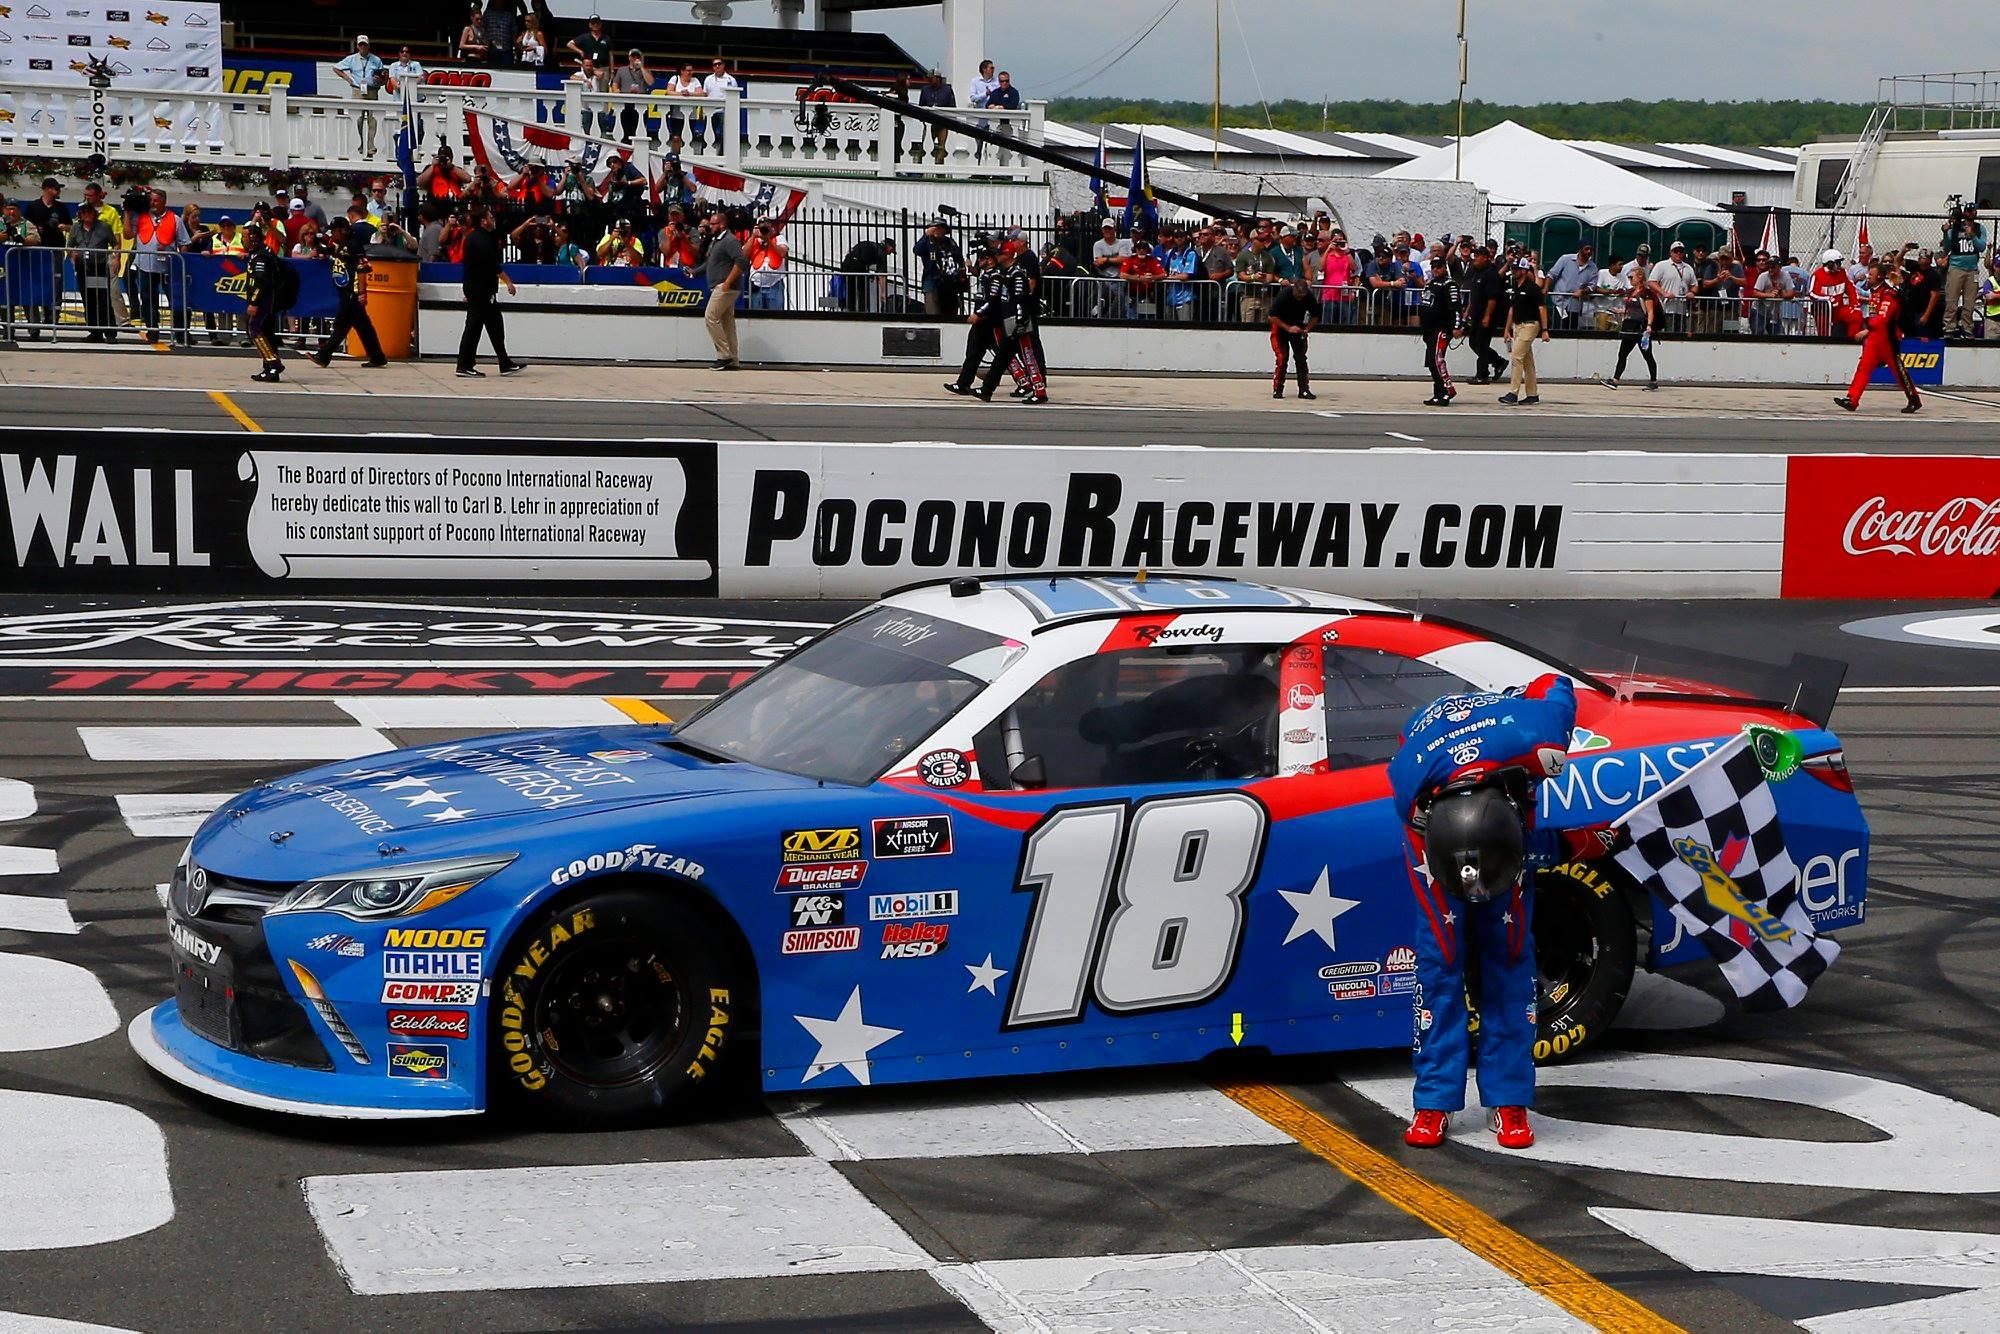 Kyle Busch bows for the Pocono Raceway crowd